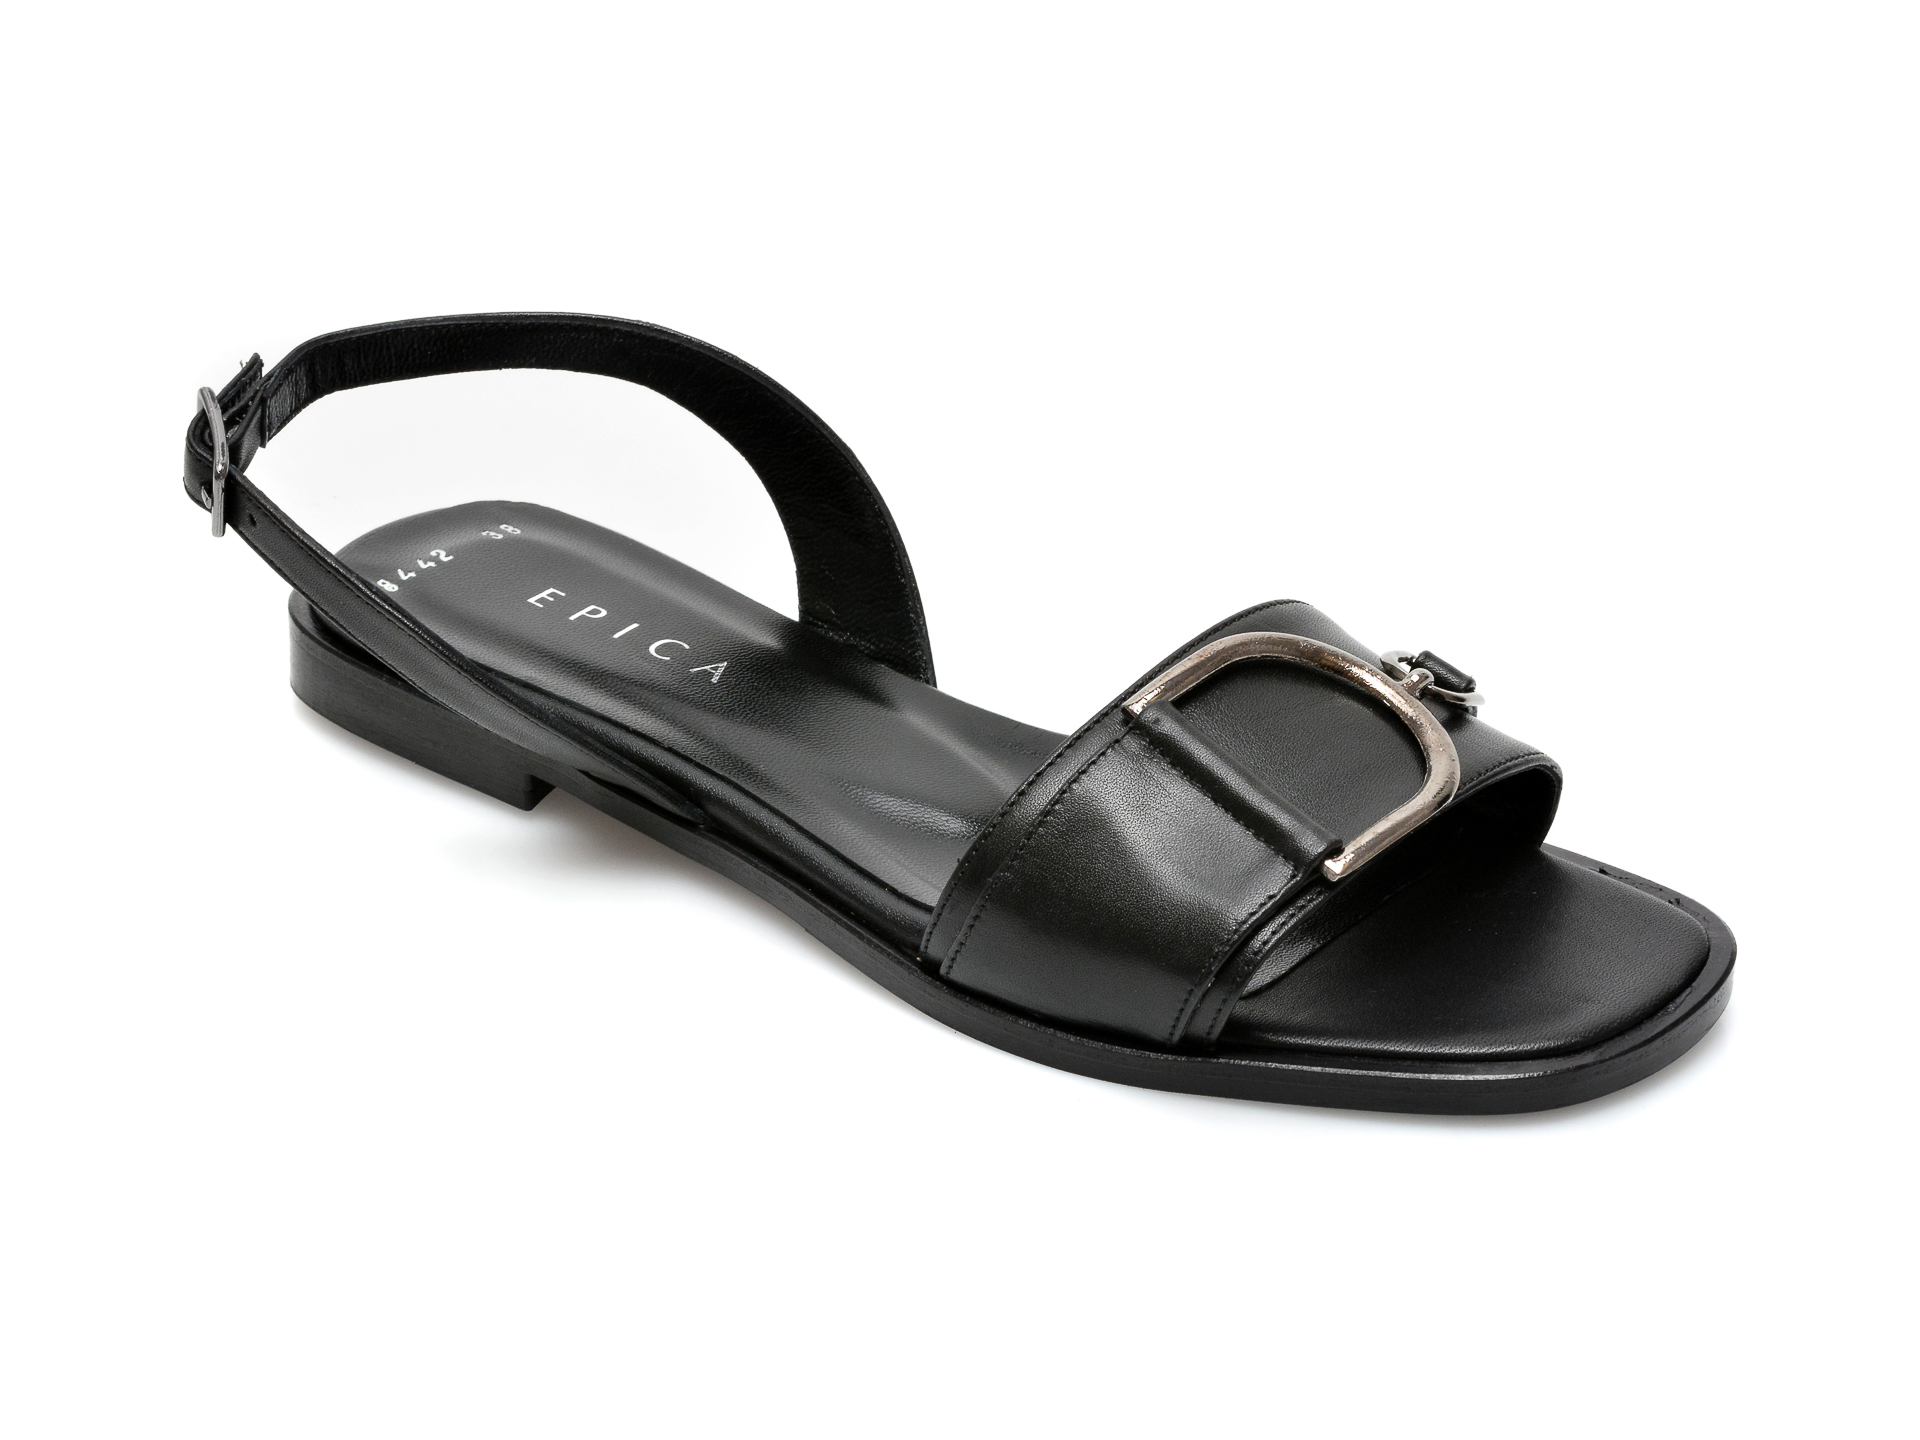 Sandale EPICA negre, 3118442, din piele naturala imagine otter.ro 2021